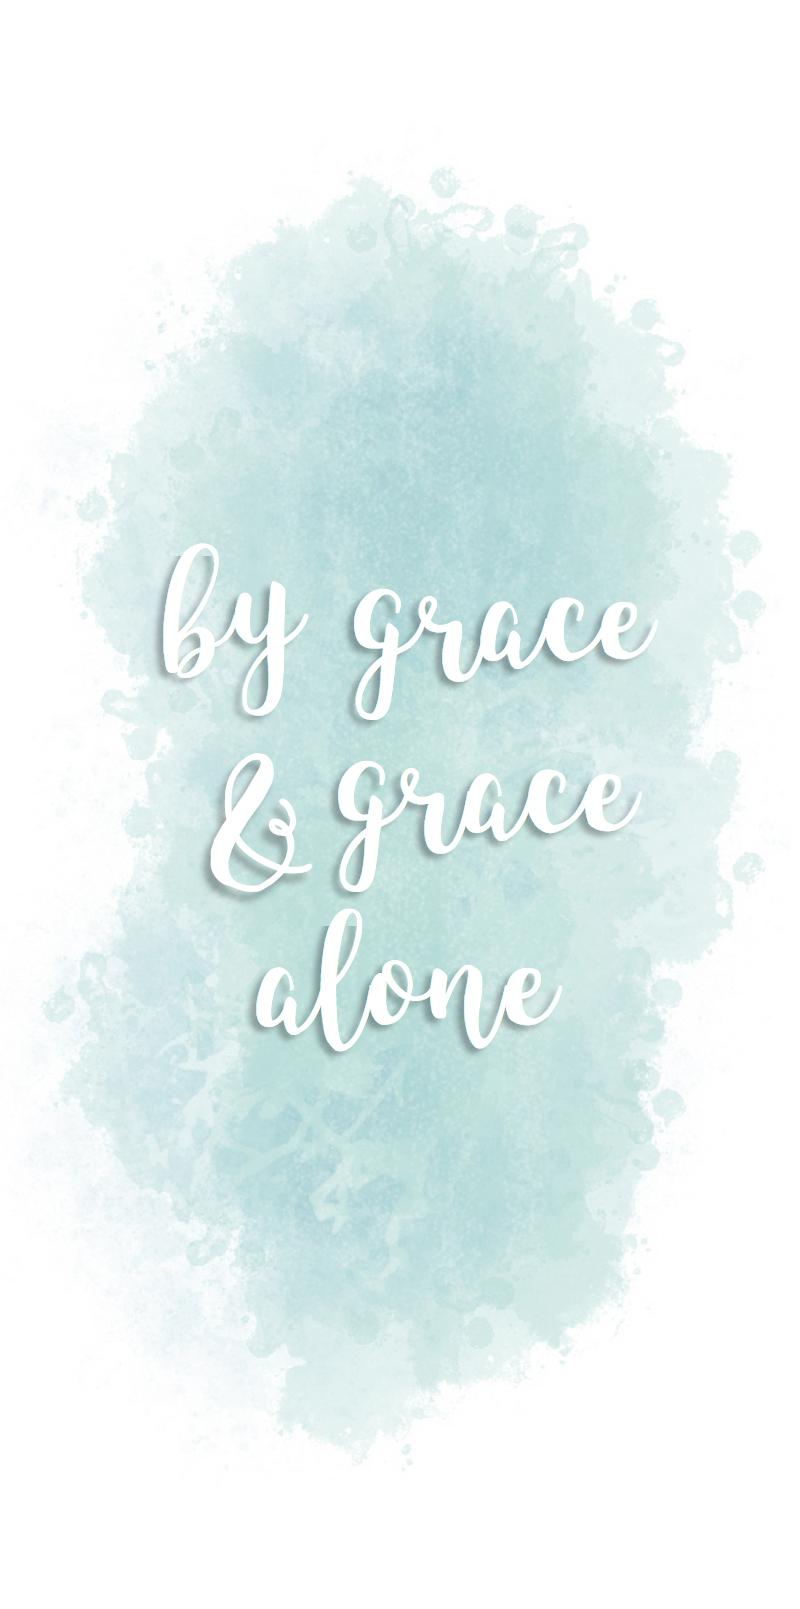 By Grace Grace Alone Blue Watercolor Iphone Wallpaper Phone Lockscreen Bible Verse Christian Inspirational Quote